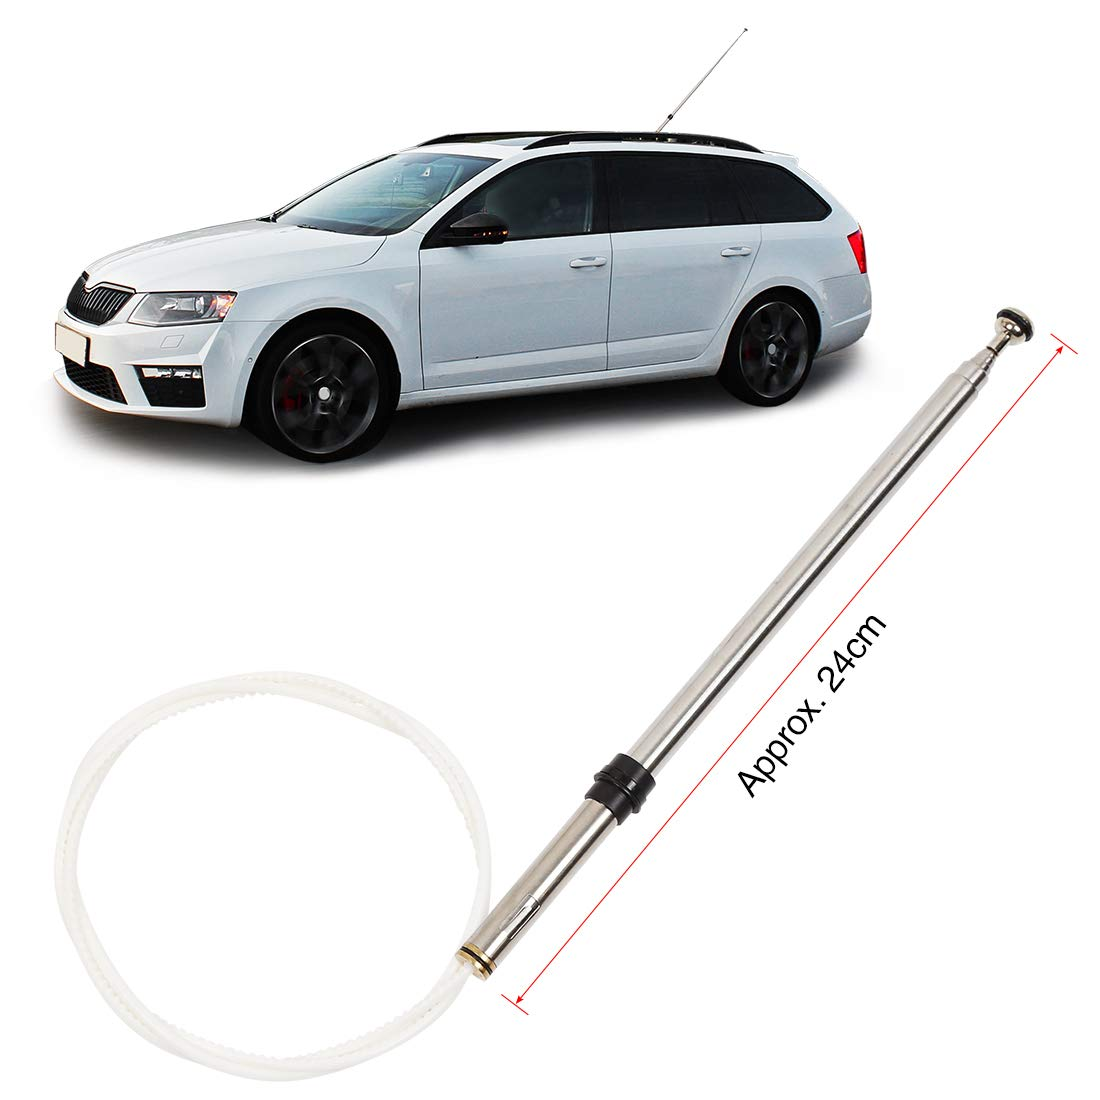 X AUTOHAUX Car Power Antenna Mast 86337-60151 for 1998-2007 Toyota Land Cruiser